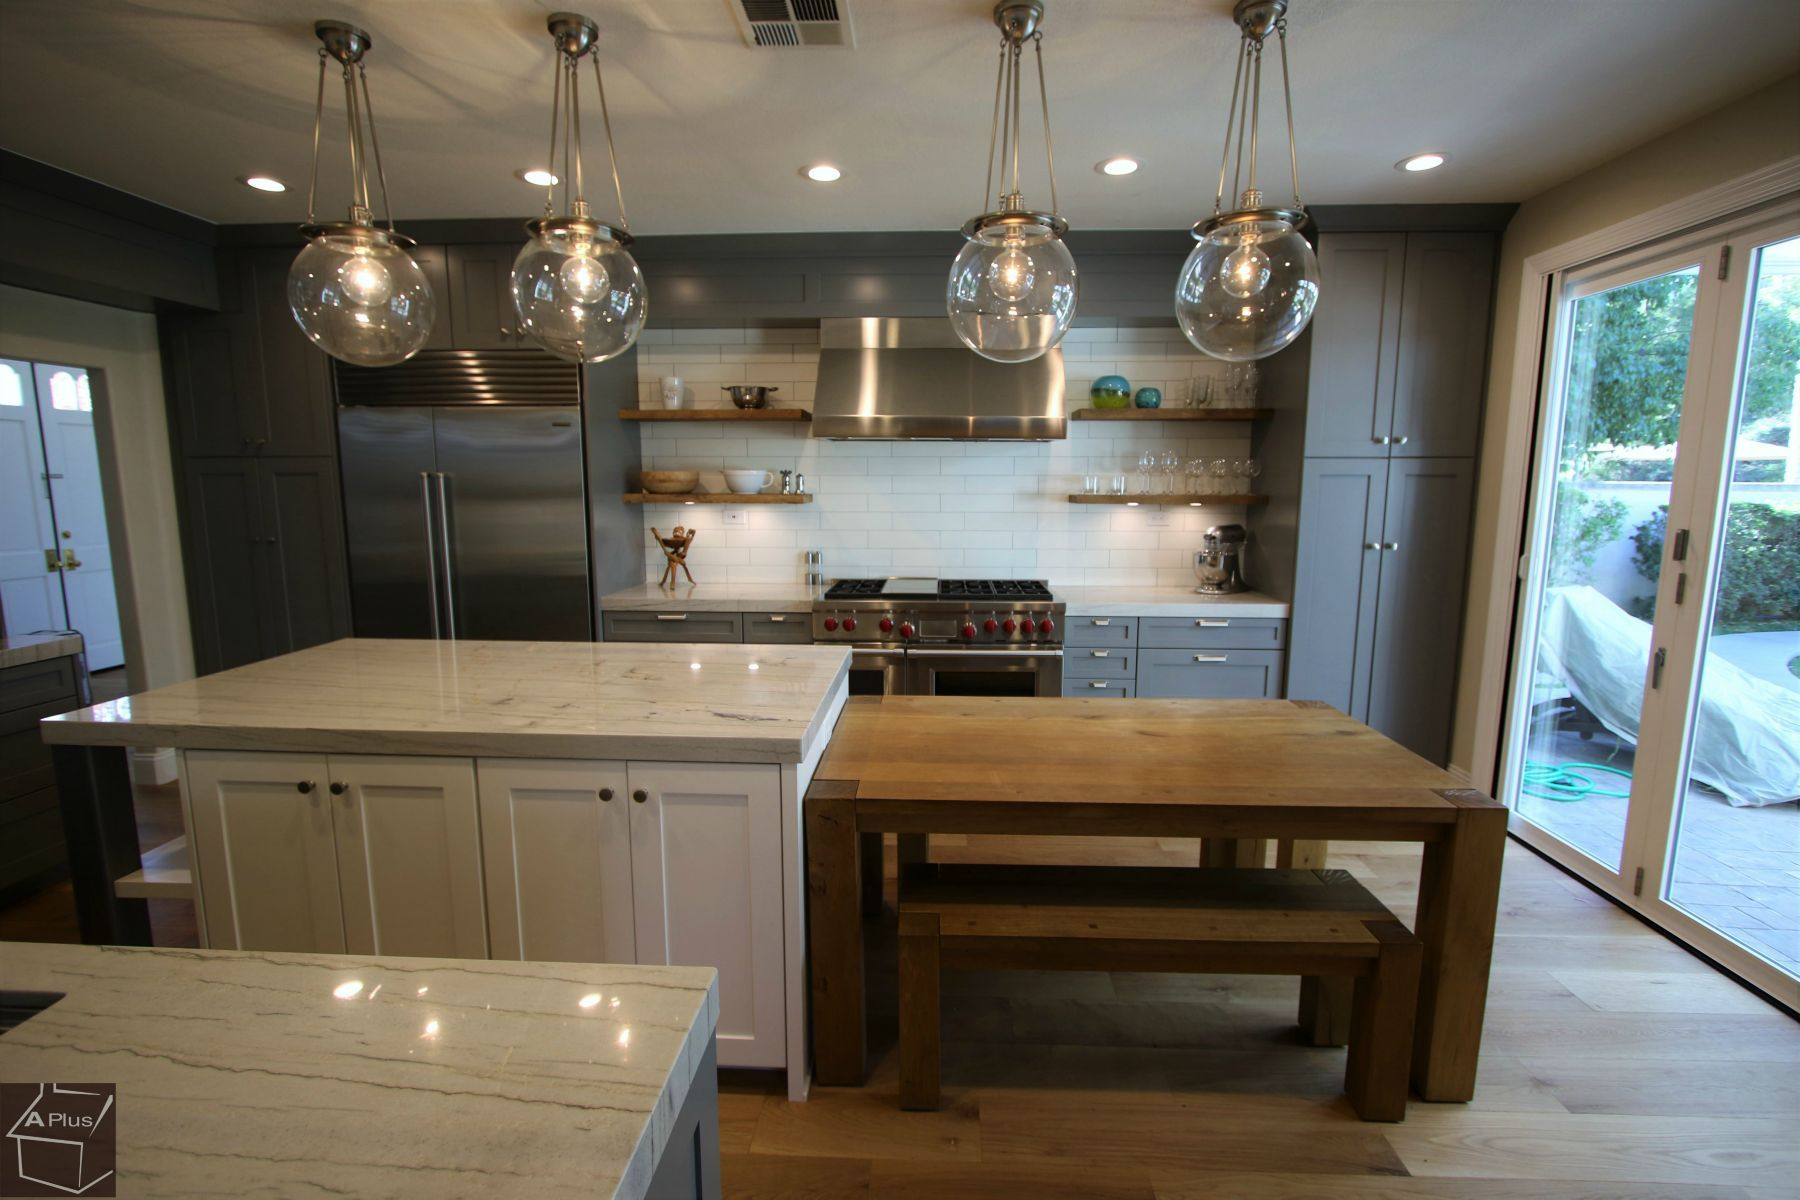 Aplus Interior Design Remodeling Kitchen Remodel Industrial